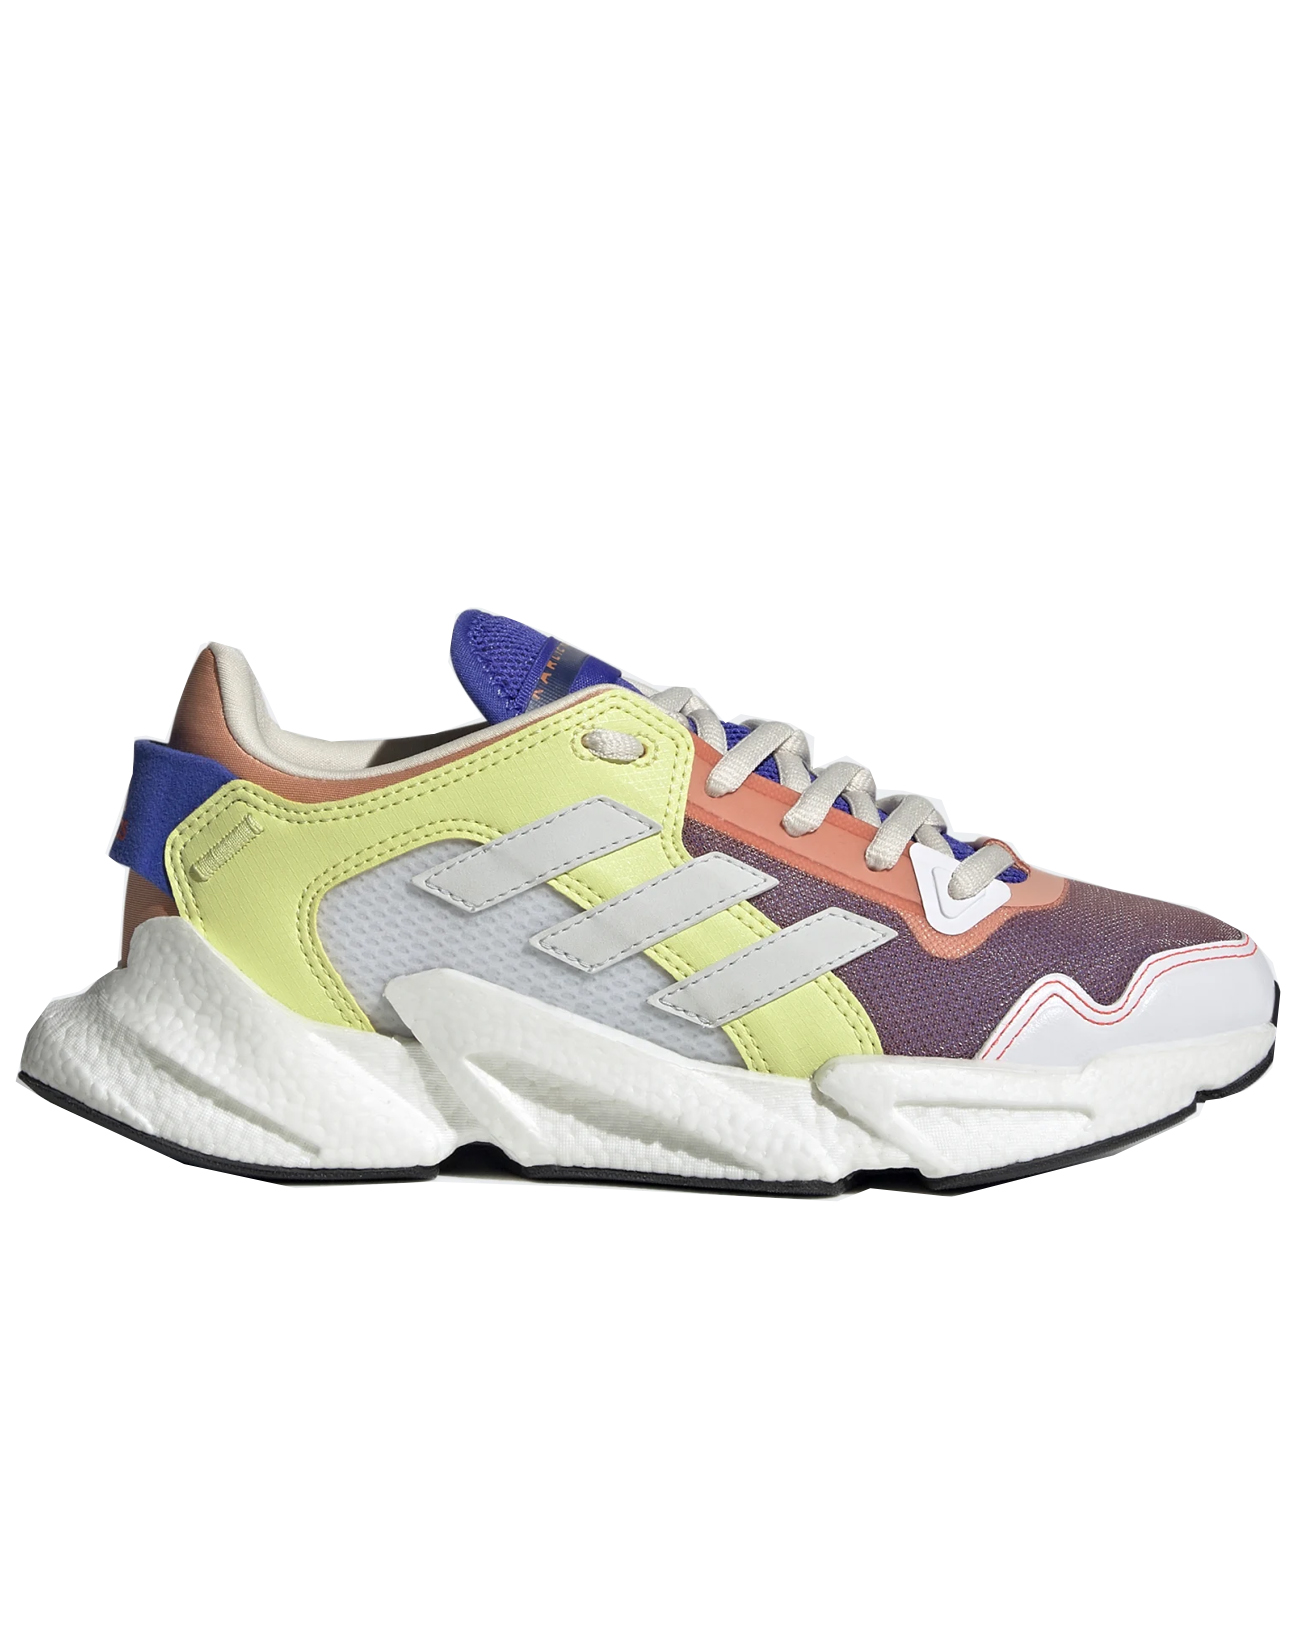 colour block sneakers 2021